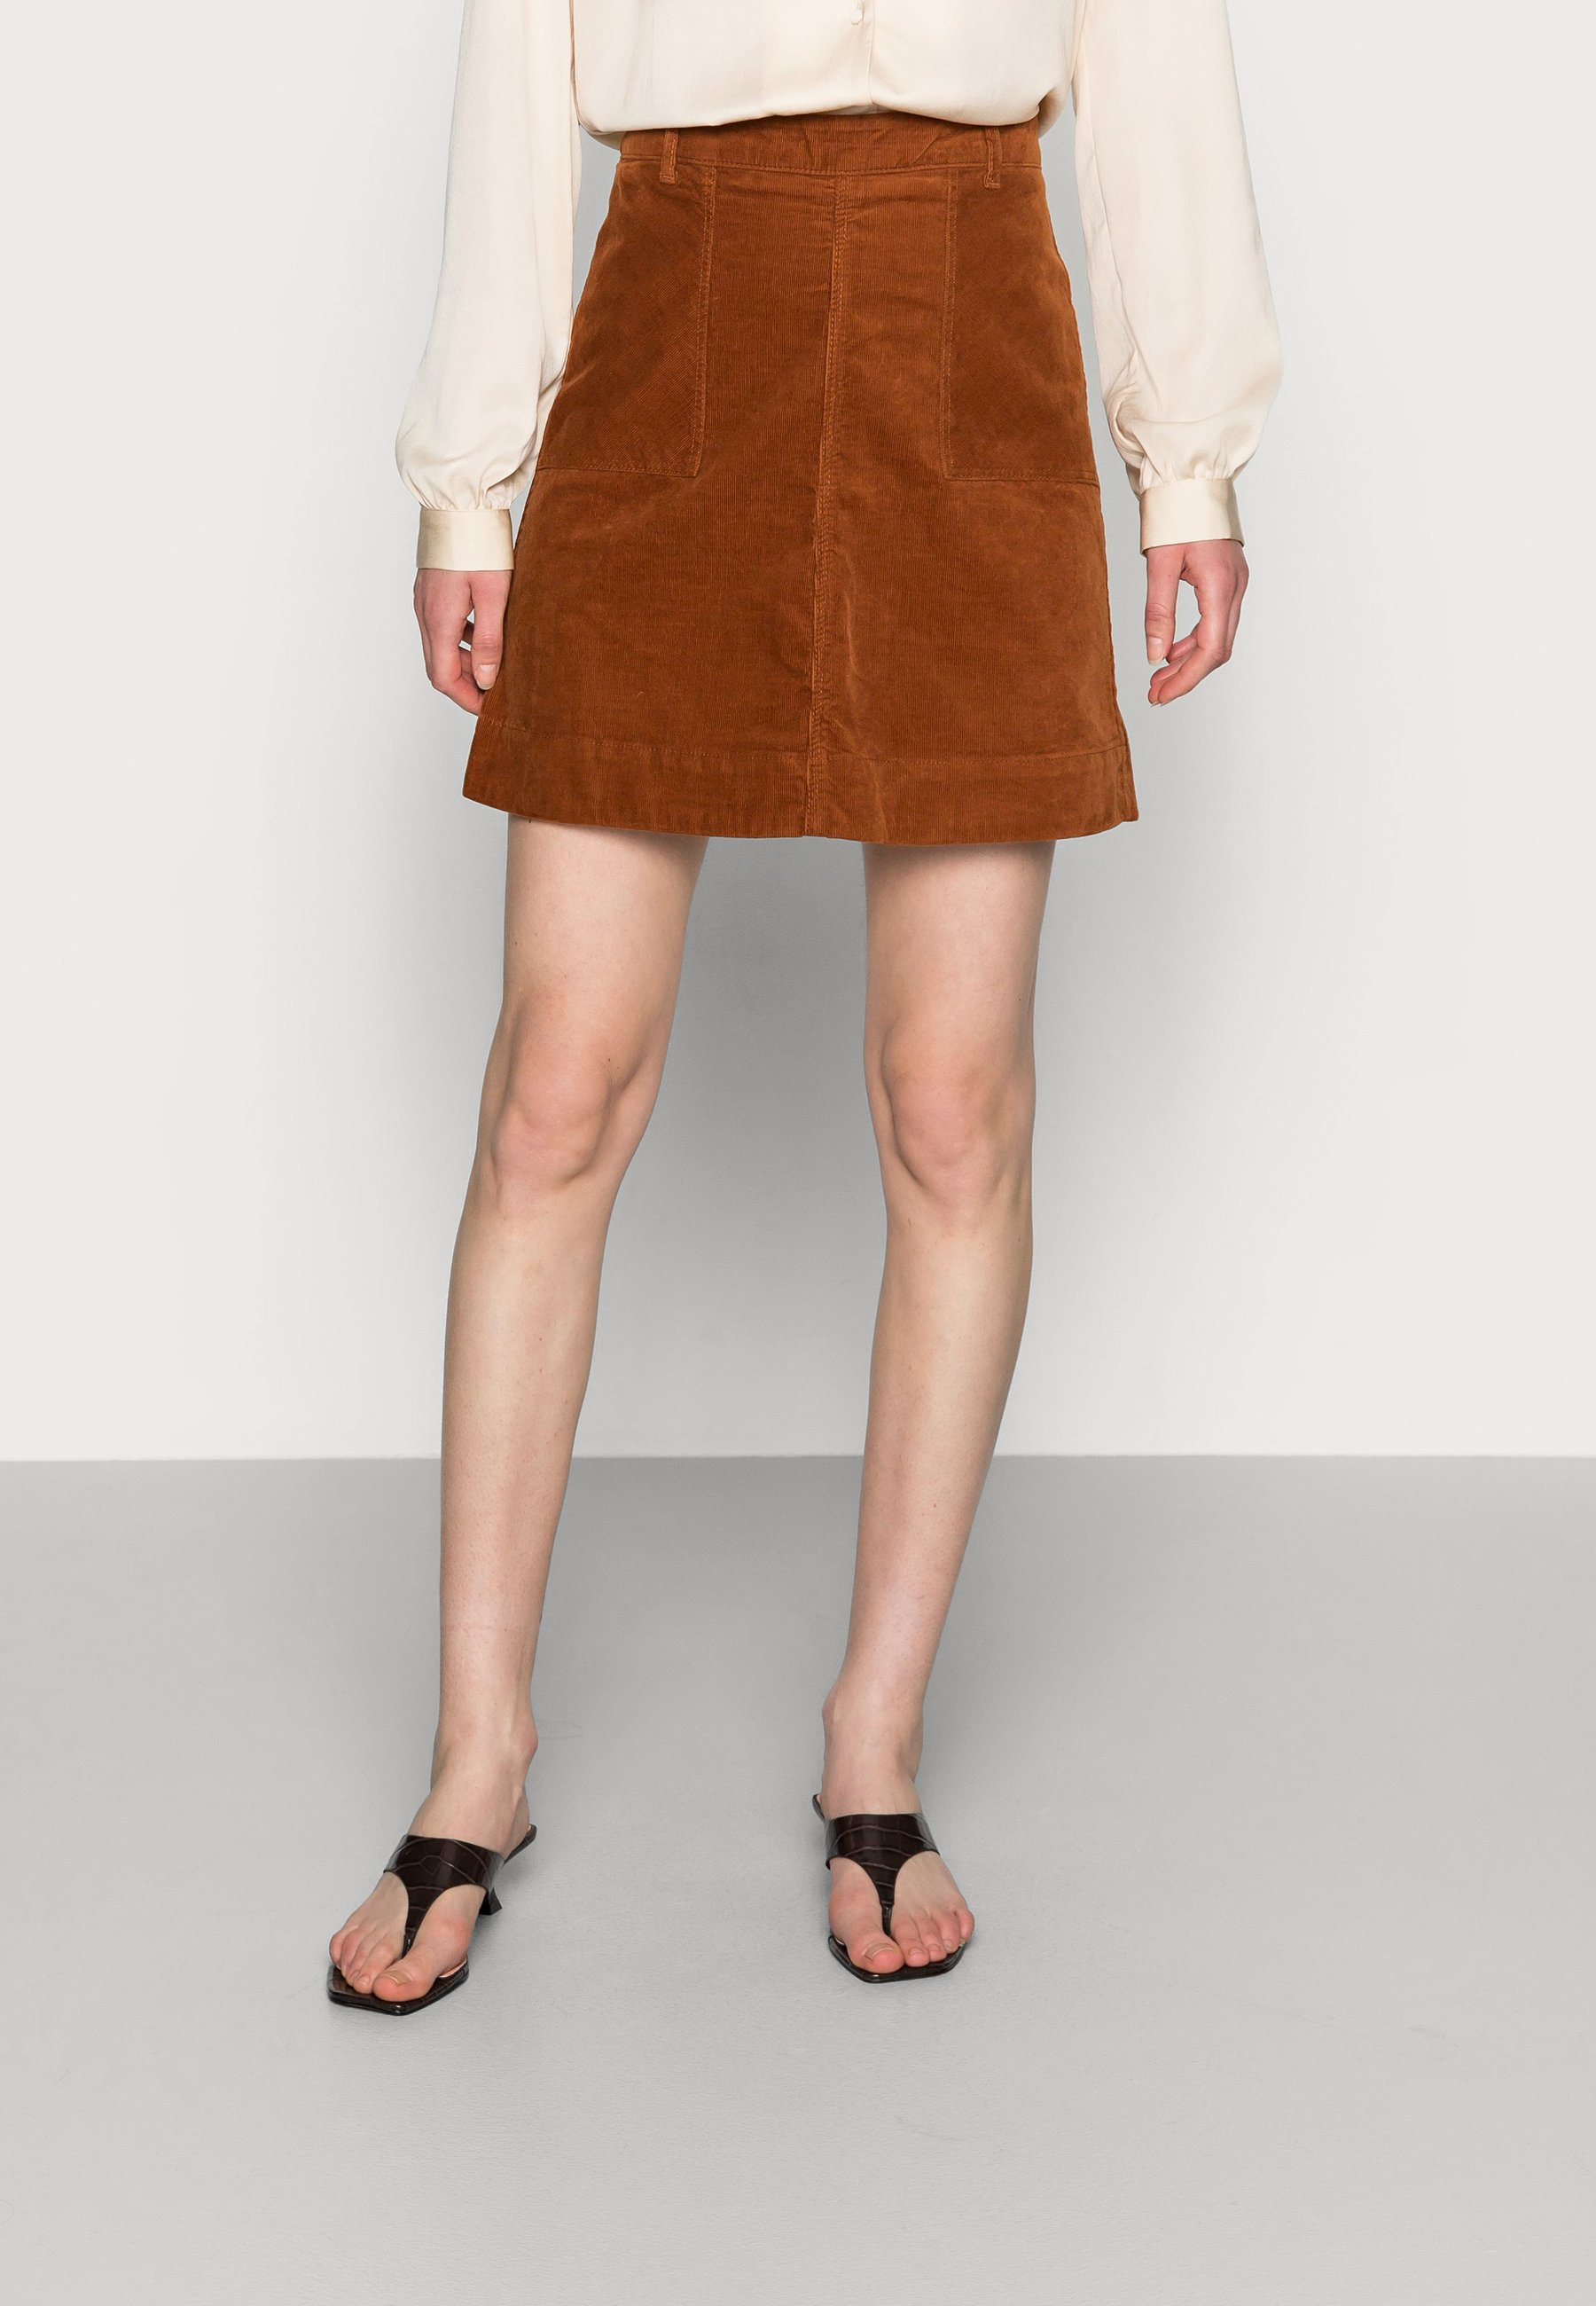 Femme VICTORIA SOLID SKIRT - Minijupe